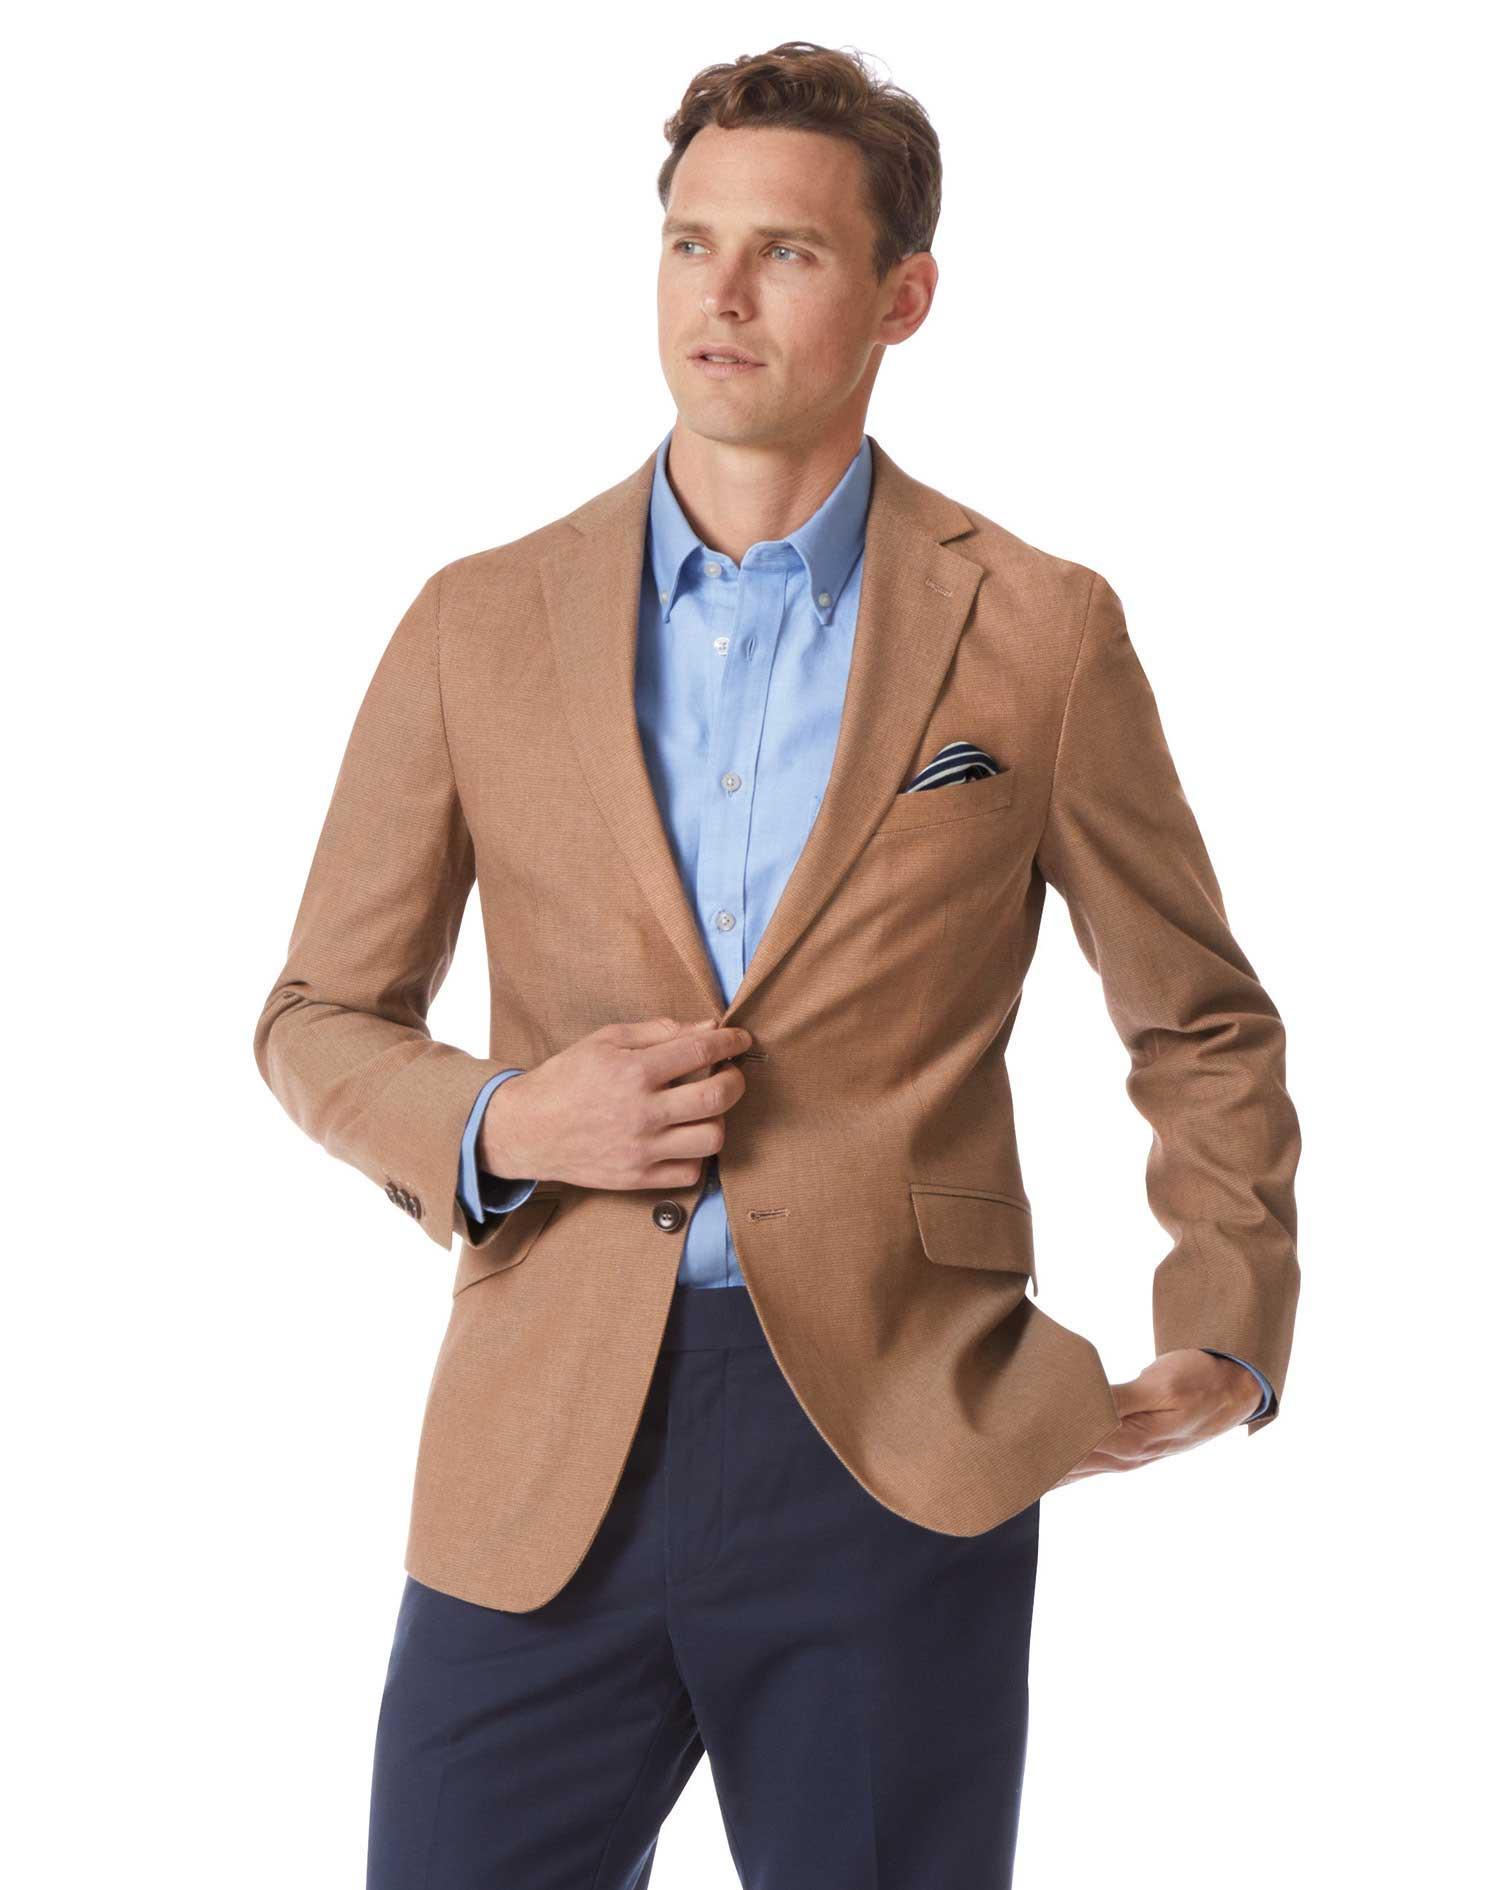 Slim Fit Tan Textured Stretch Cotton Jacket Size 46 Regular by Charles Tyrwhitt